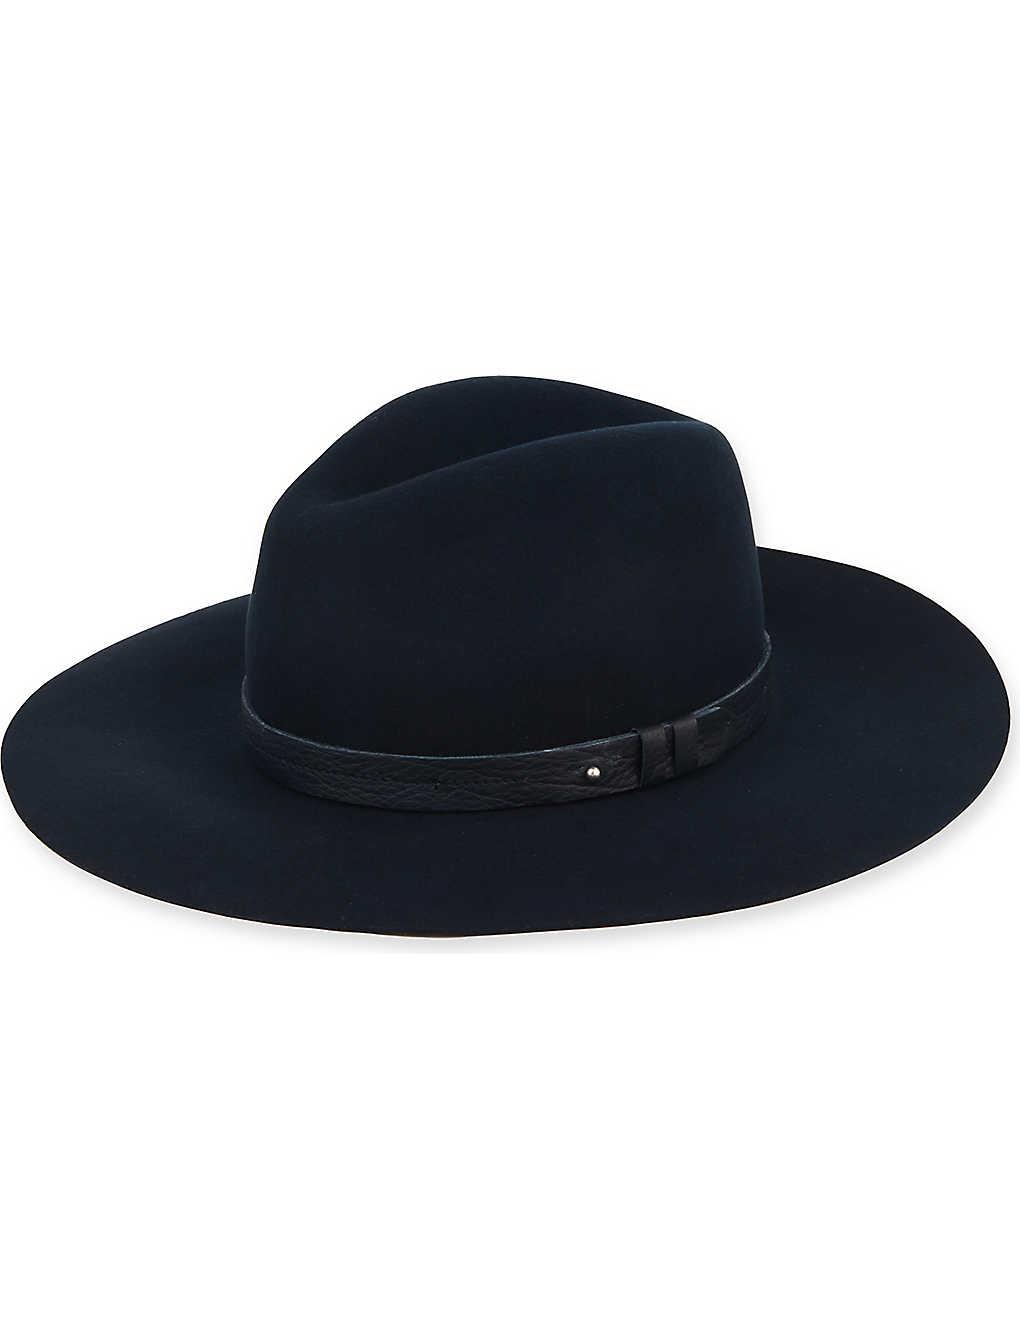 RAG   BONE - Wide brim fedora hat  39a0946b94d